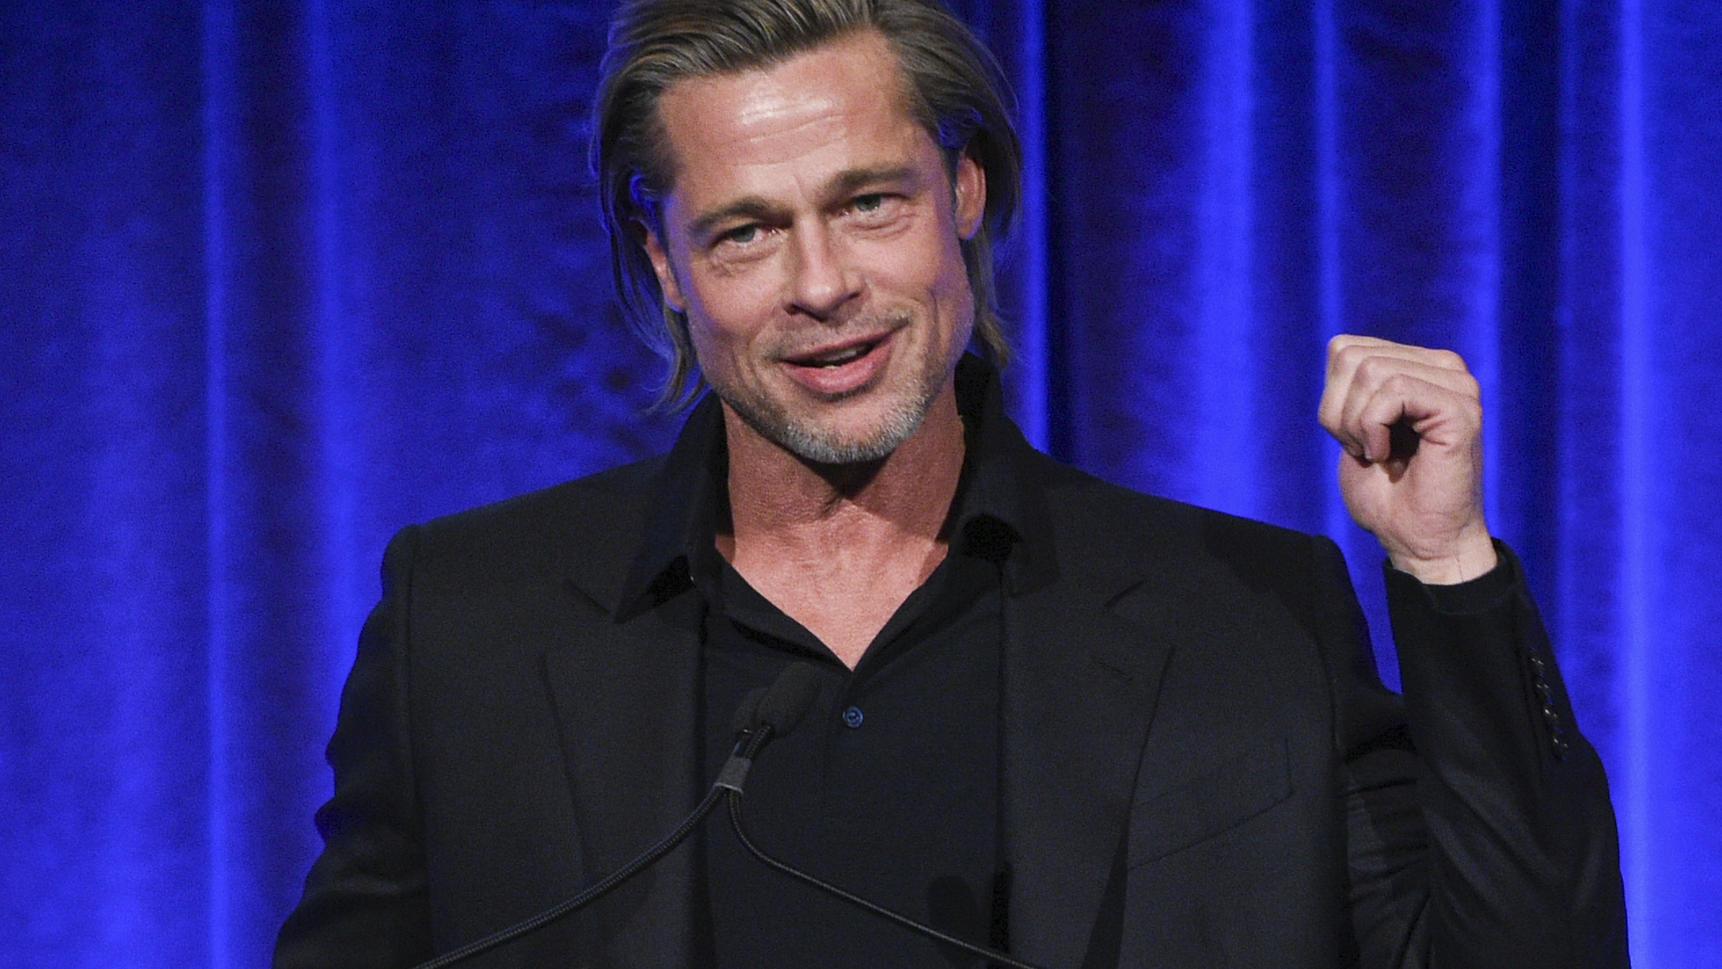 Groupons hottest deal ever: A chance to meet Brad Pitt